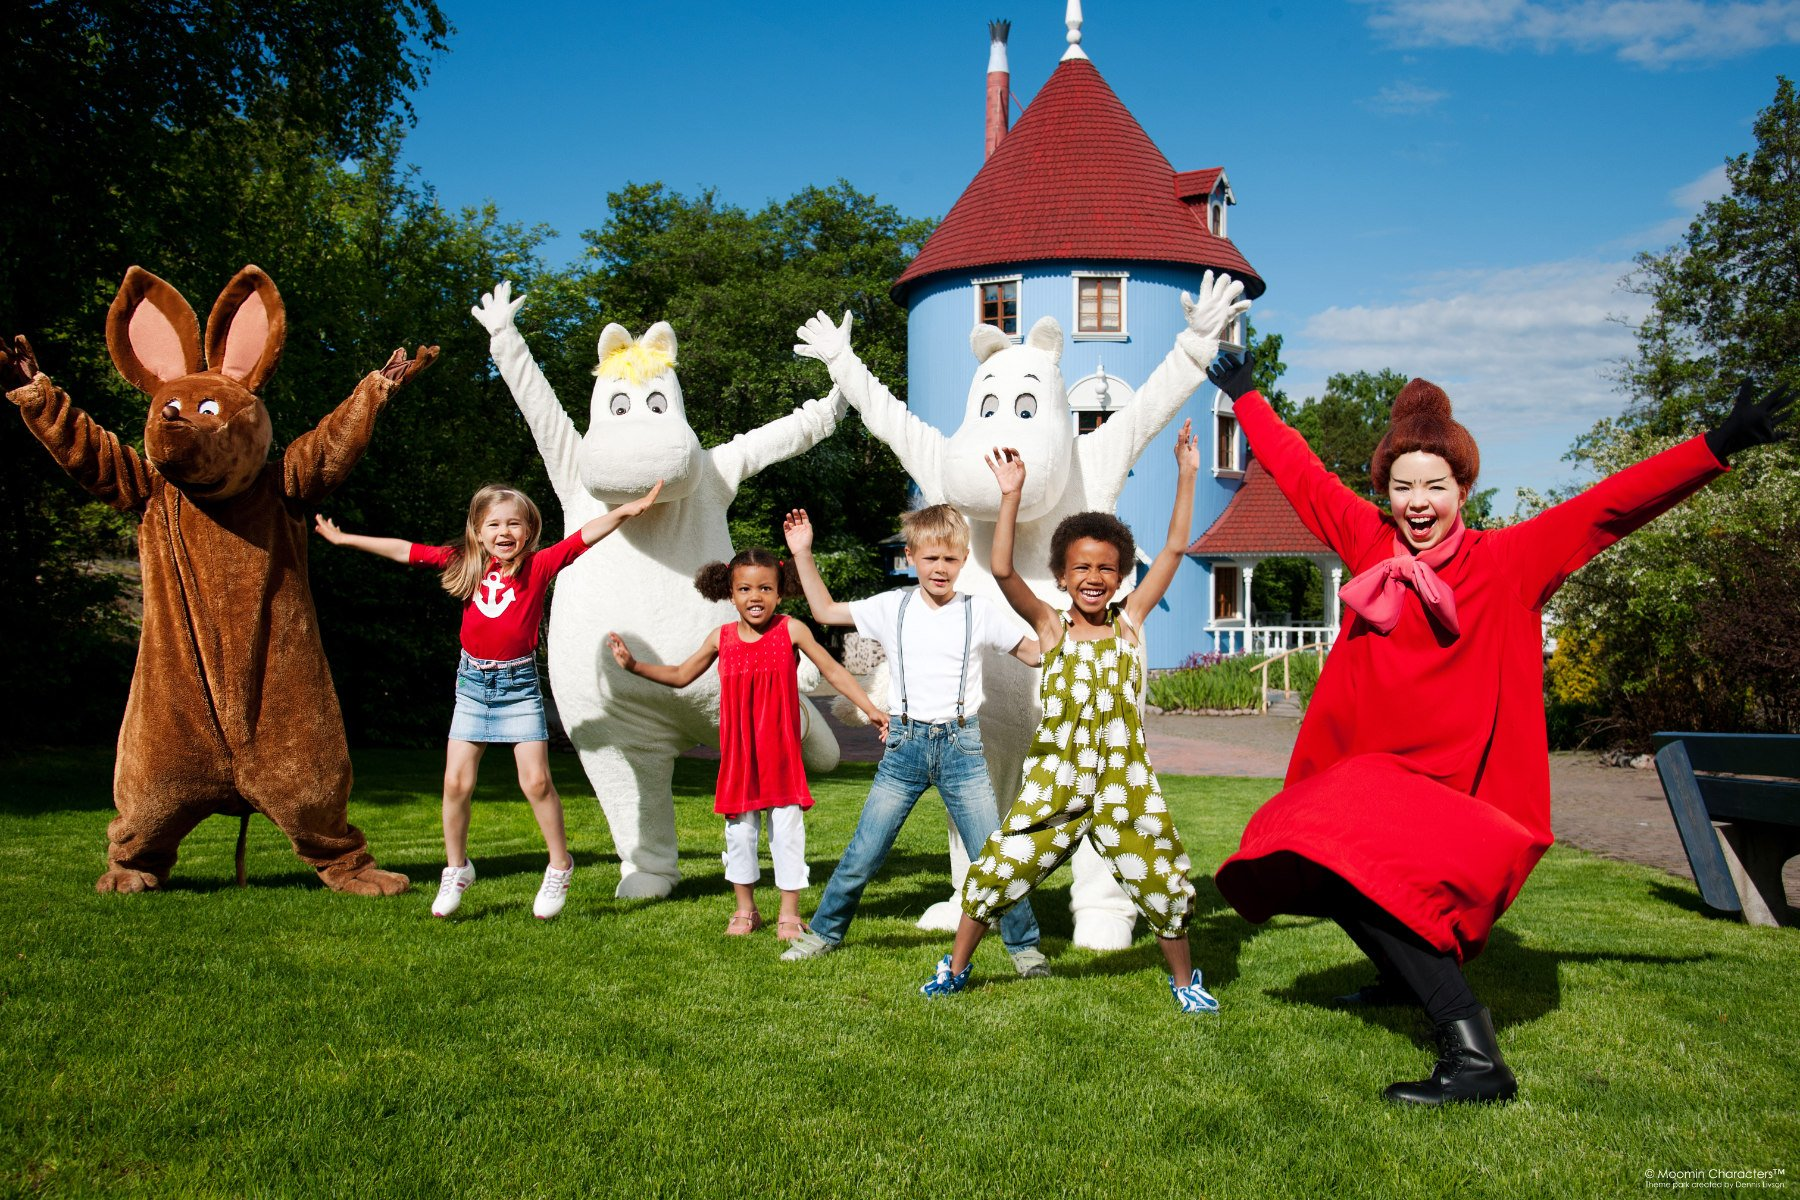 moominland nordic travel kids fun